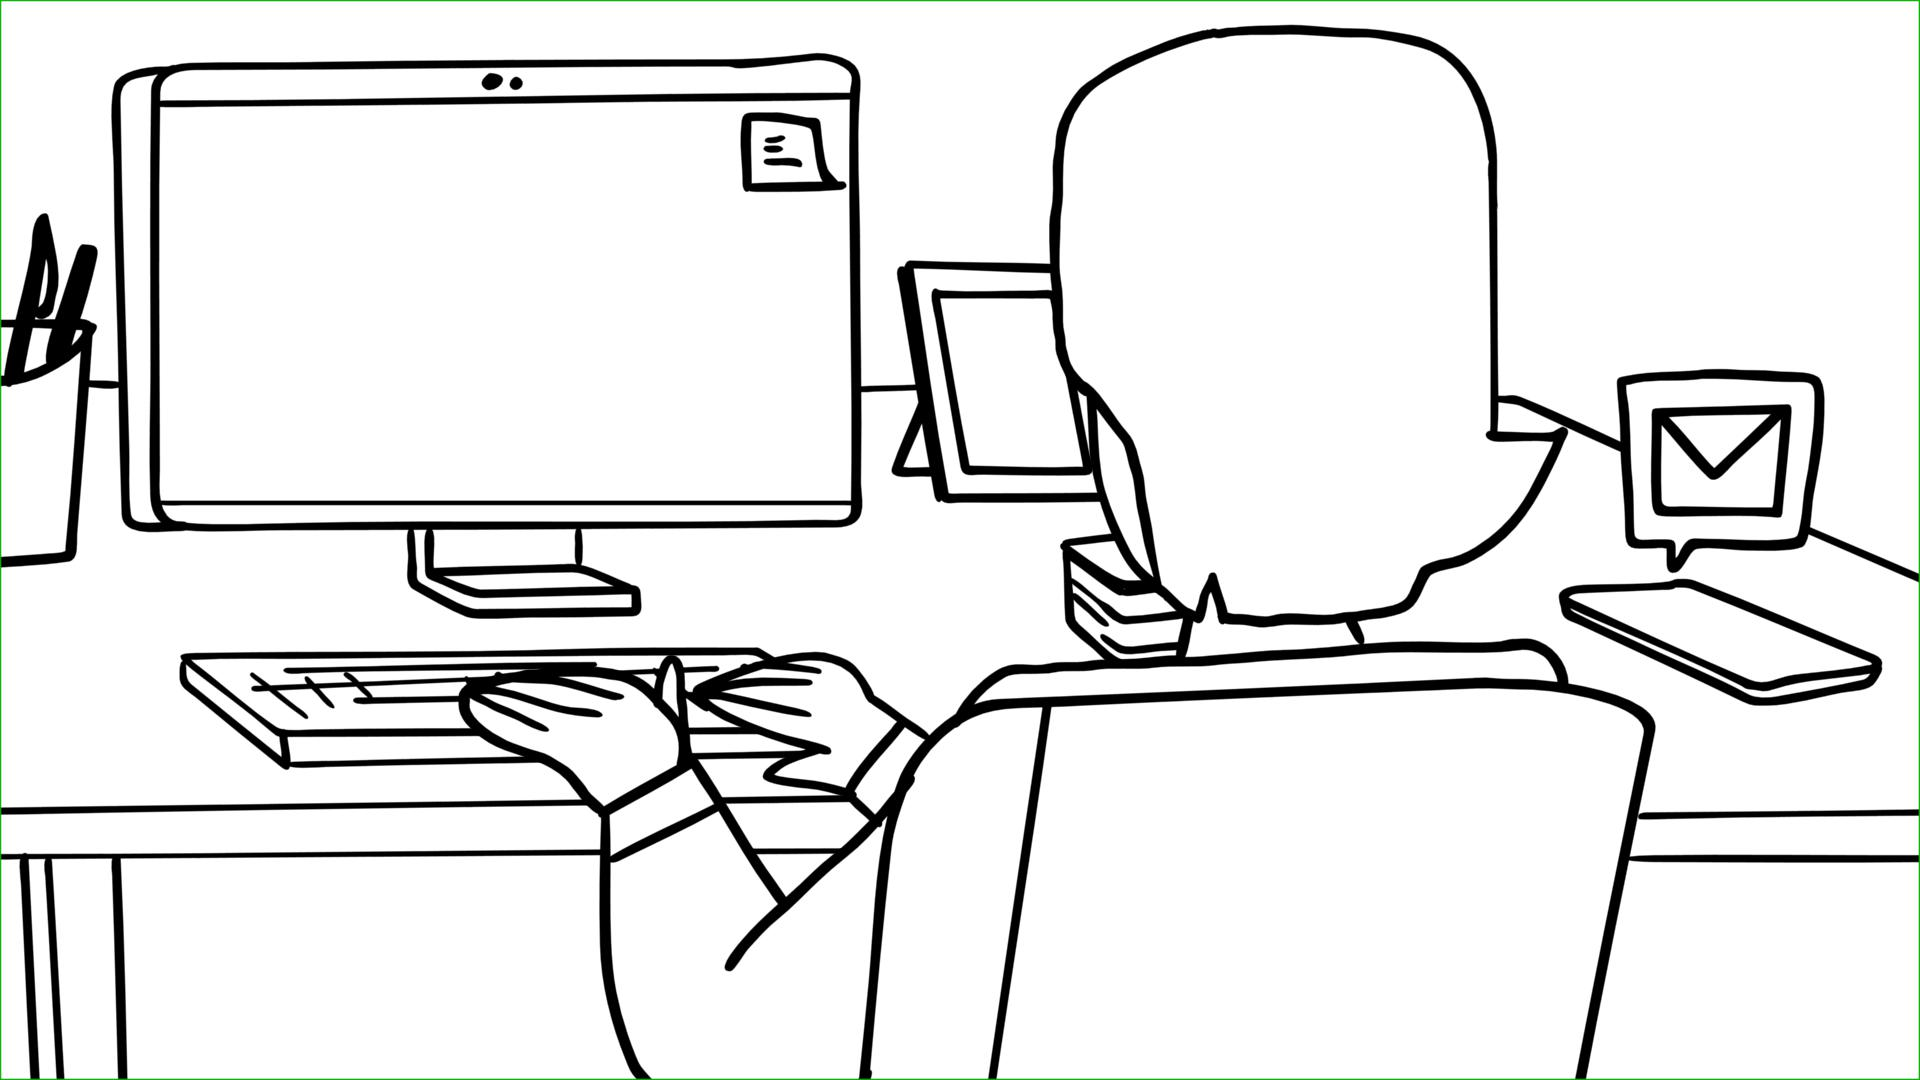 Medici_Storyboards_01-0000001_A-05.jpg